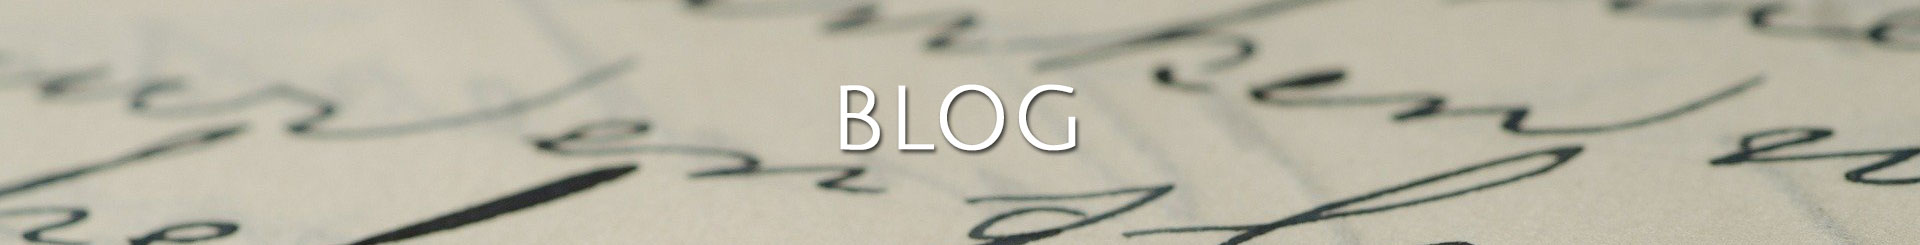 blog-hover